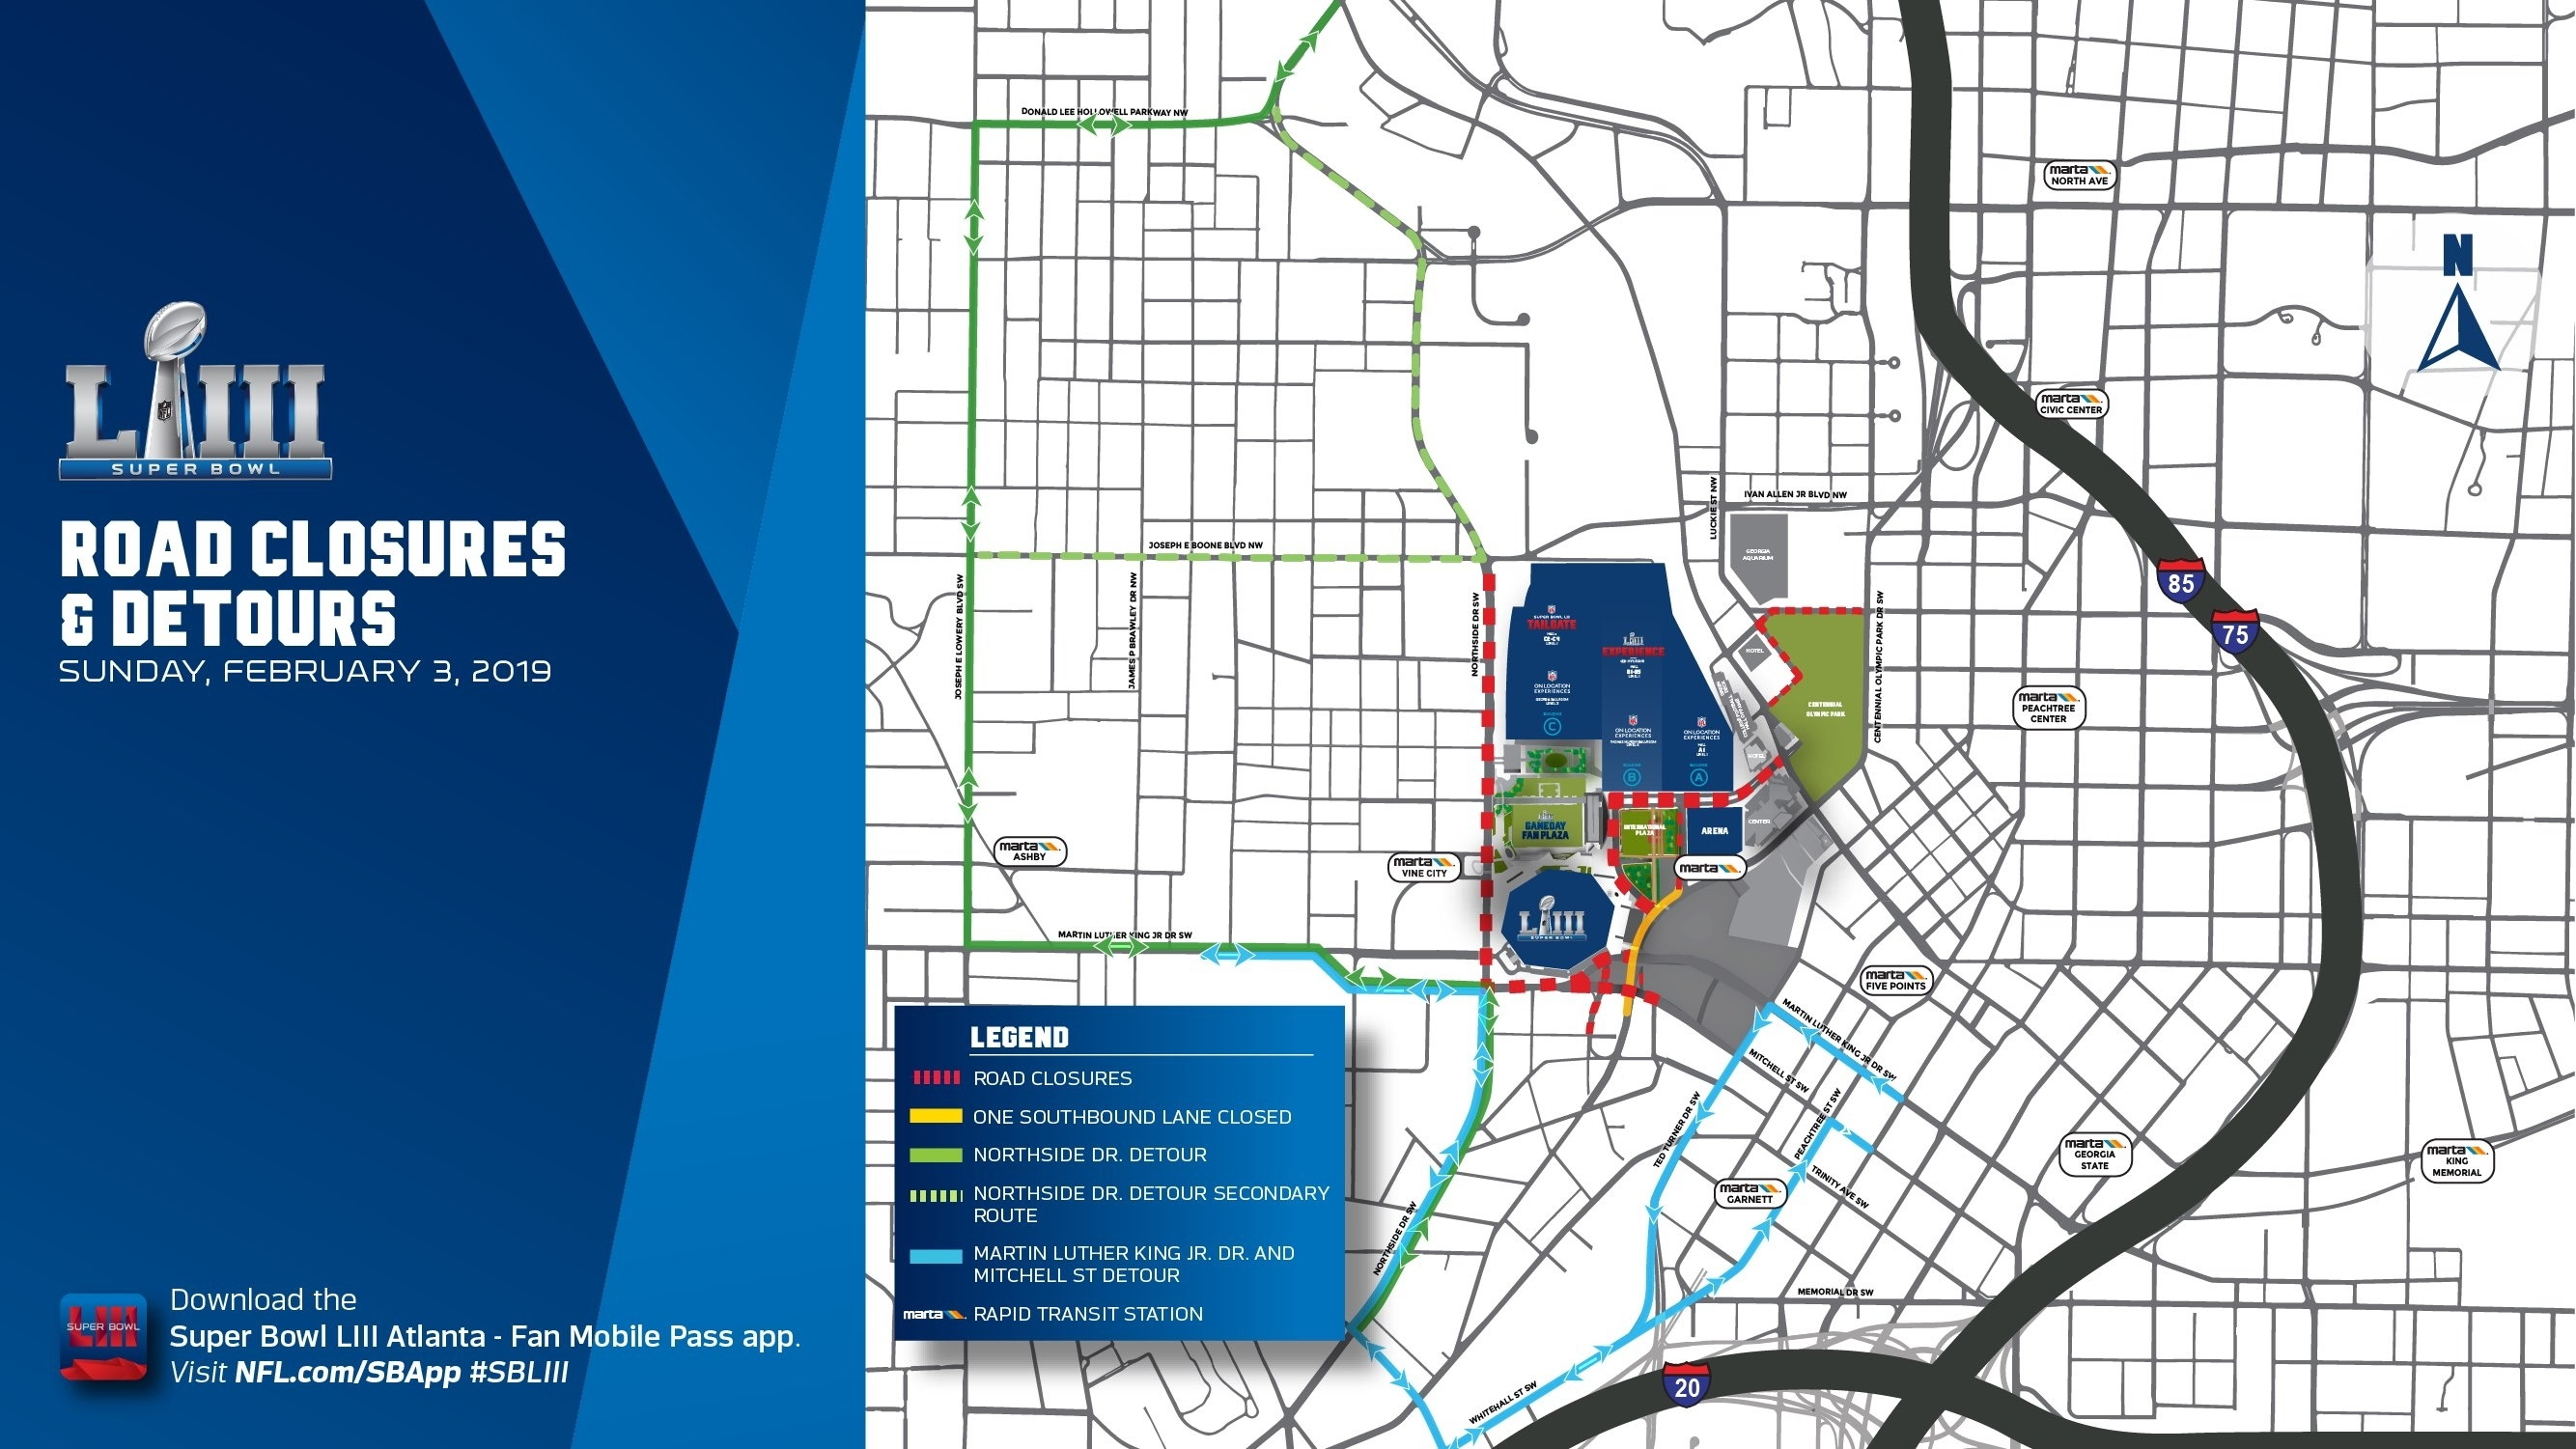 Gameday-Road-Closure-Map Copy - Mercedes Benz Stadium pertaining to Super Bowl Road Closures Map